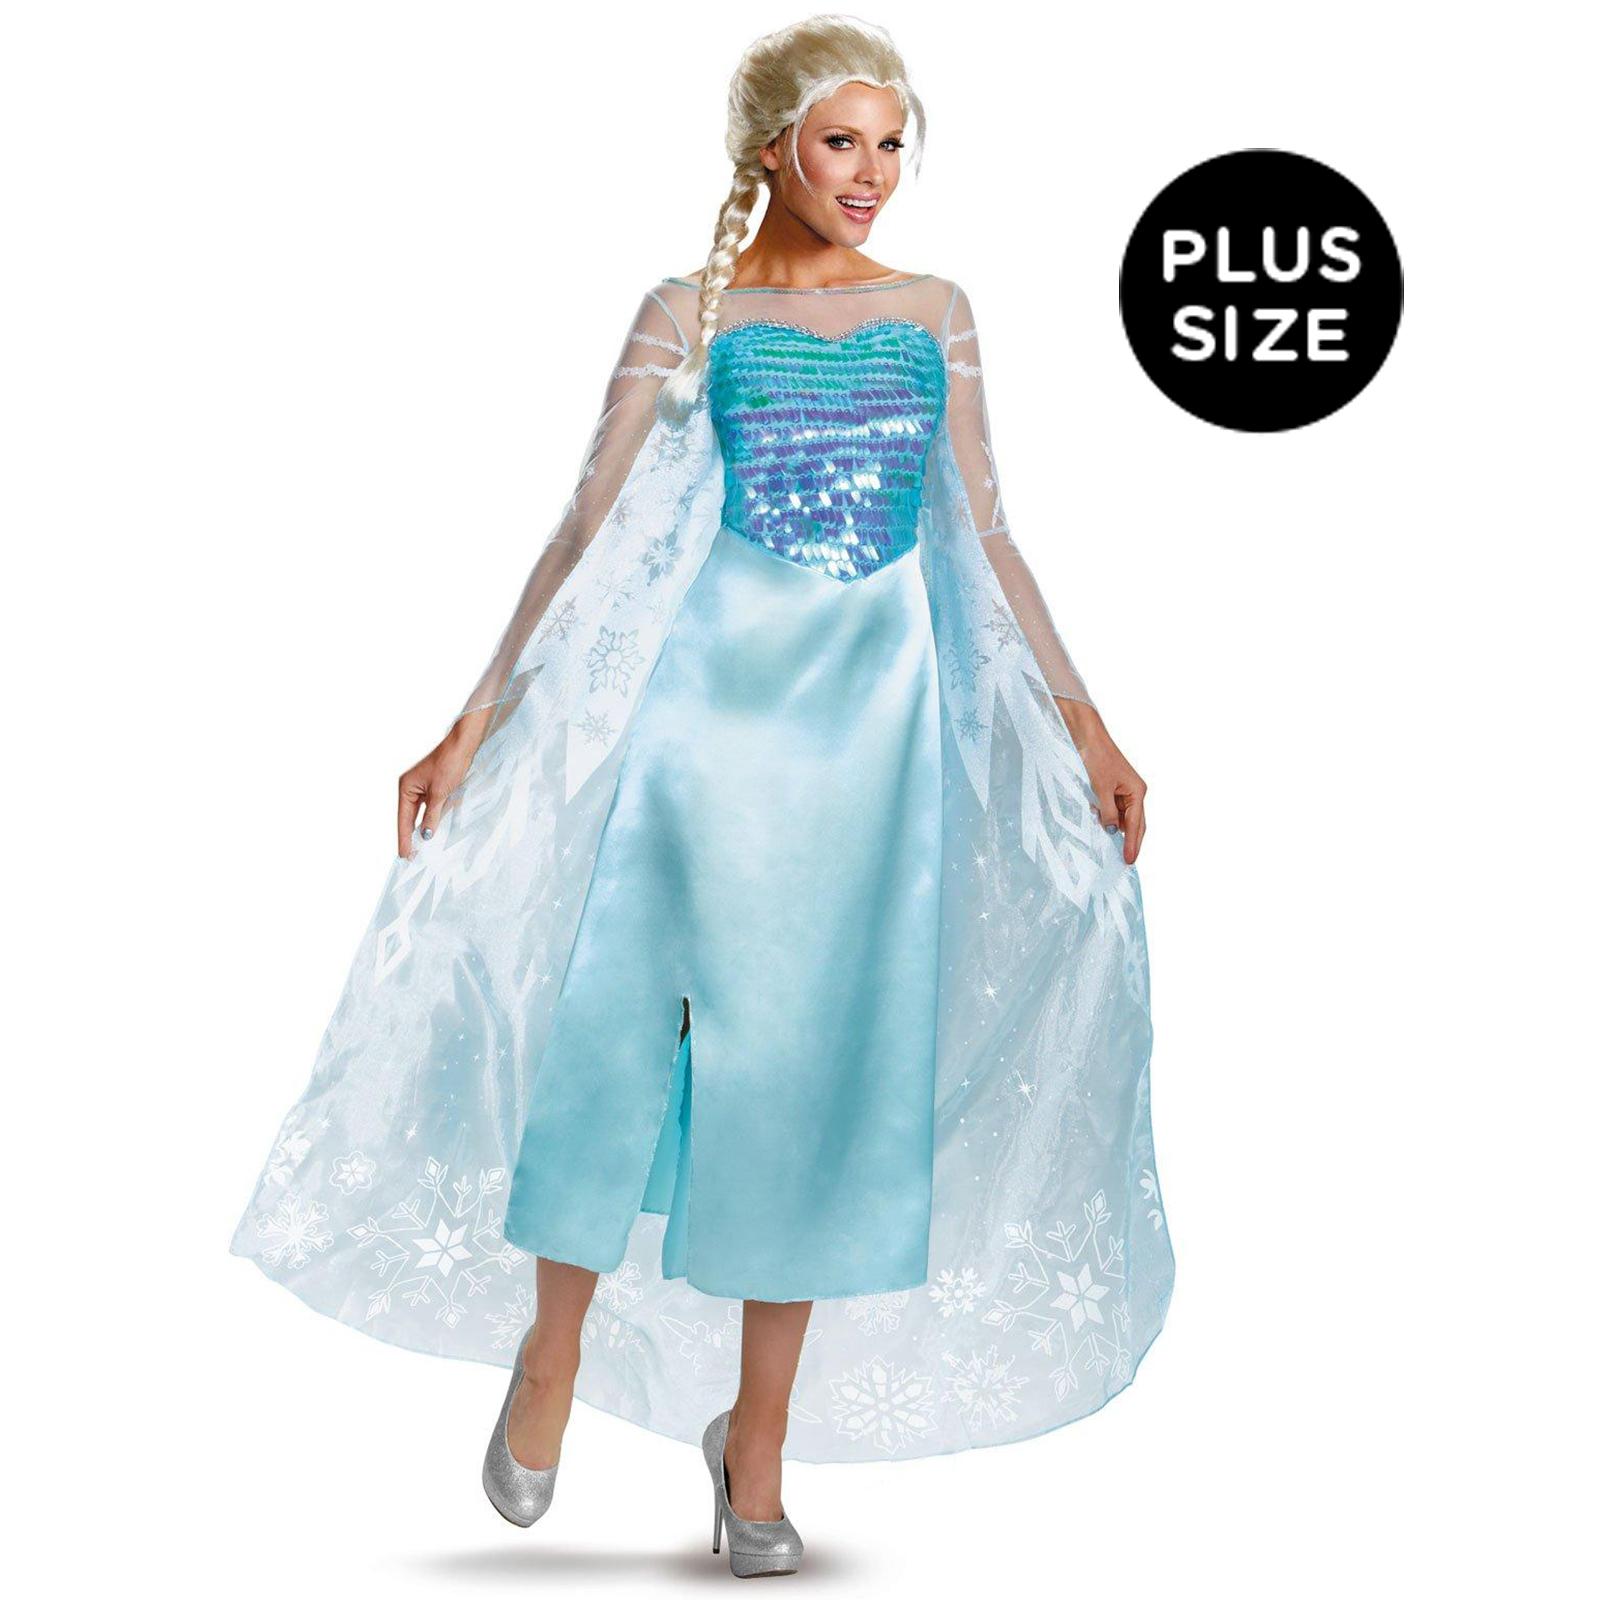 Disney Frozen   Plus Size Deluxe Elsa Dress   Female   Size Plus (18